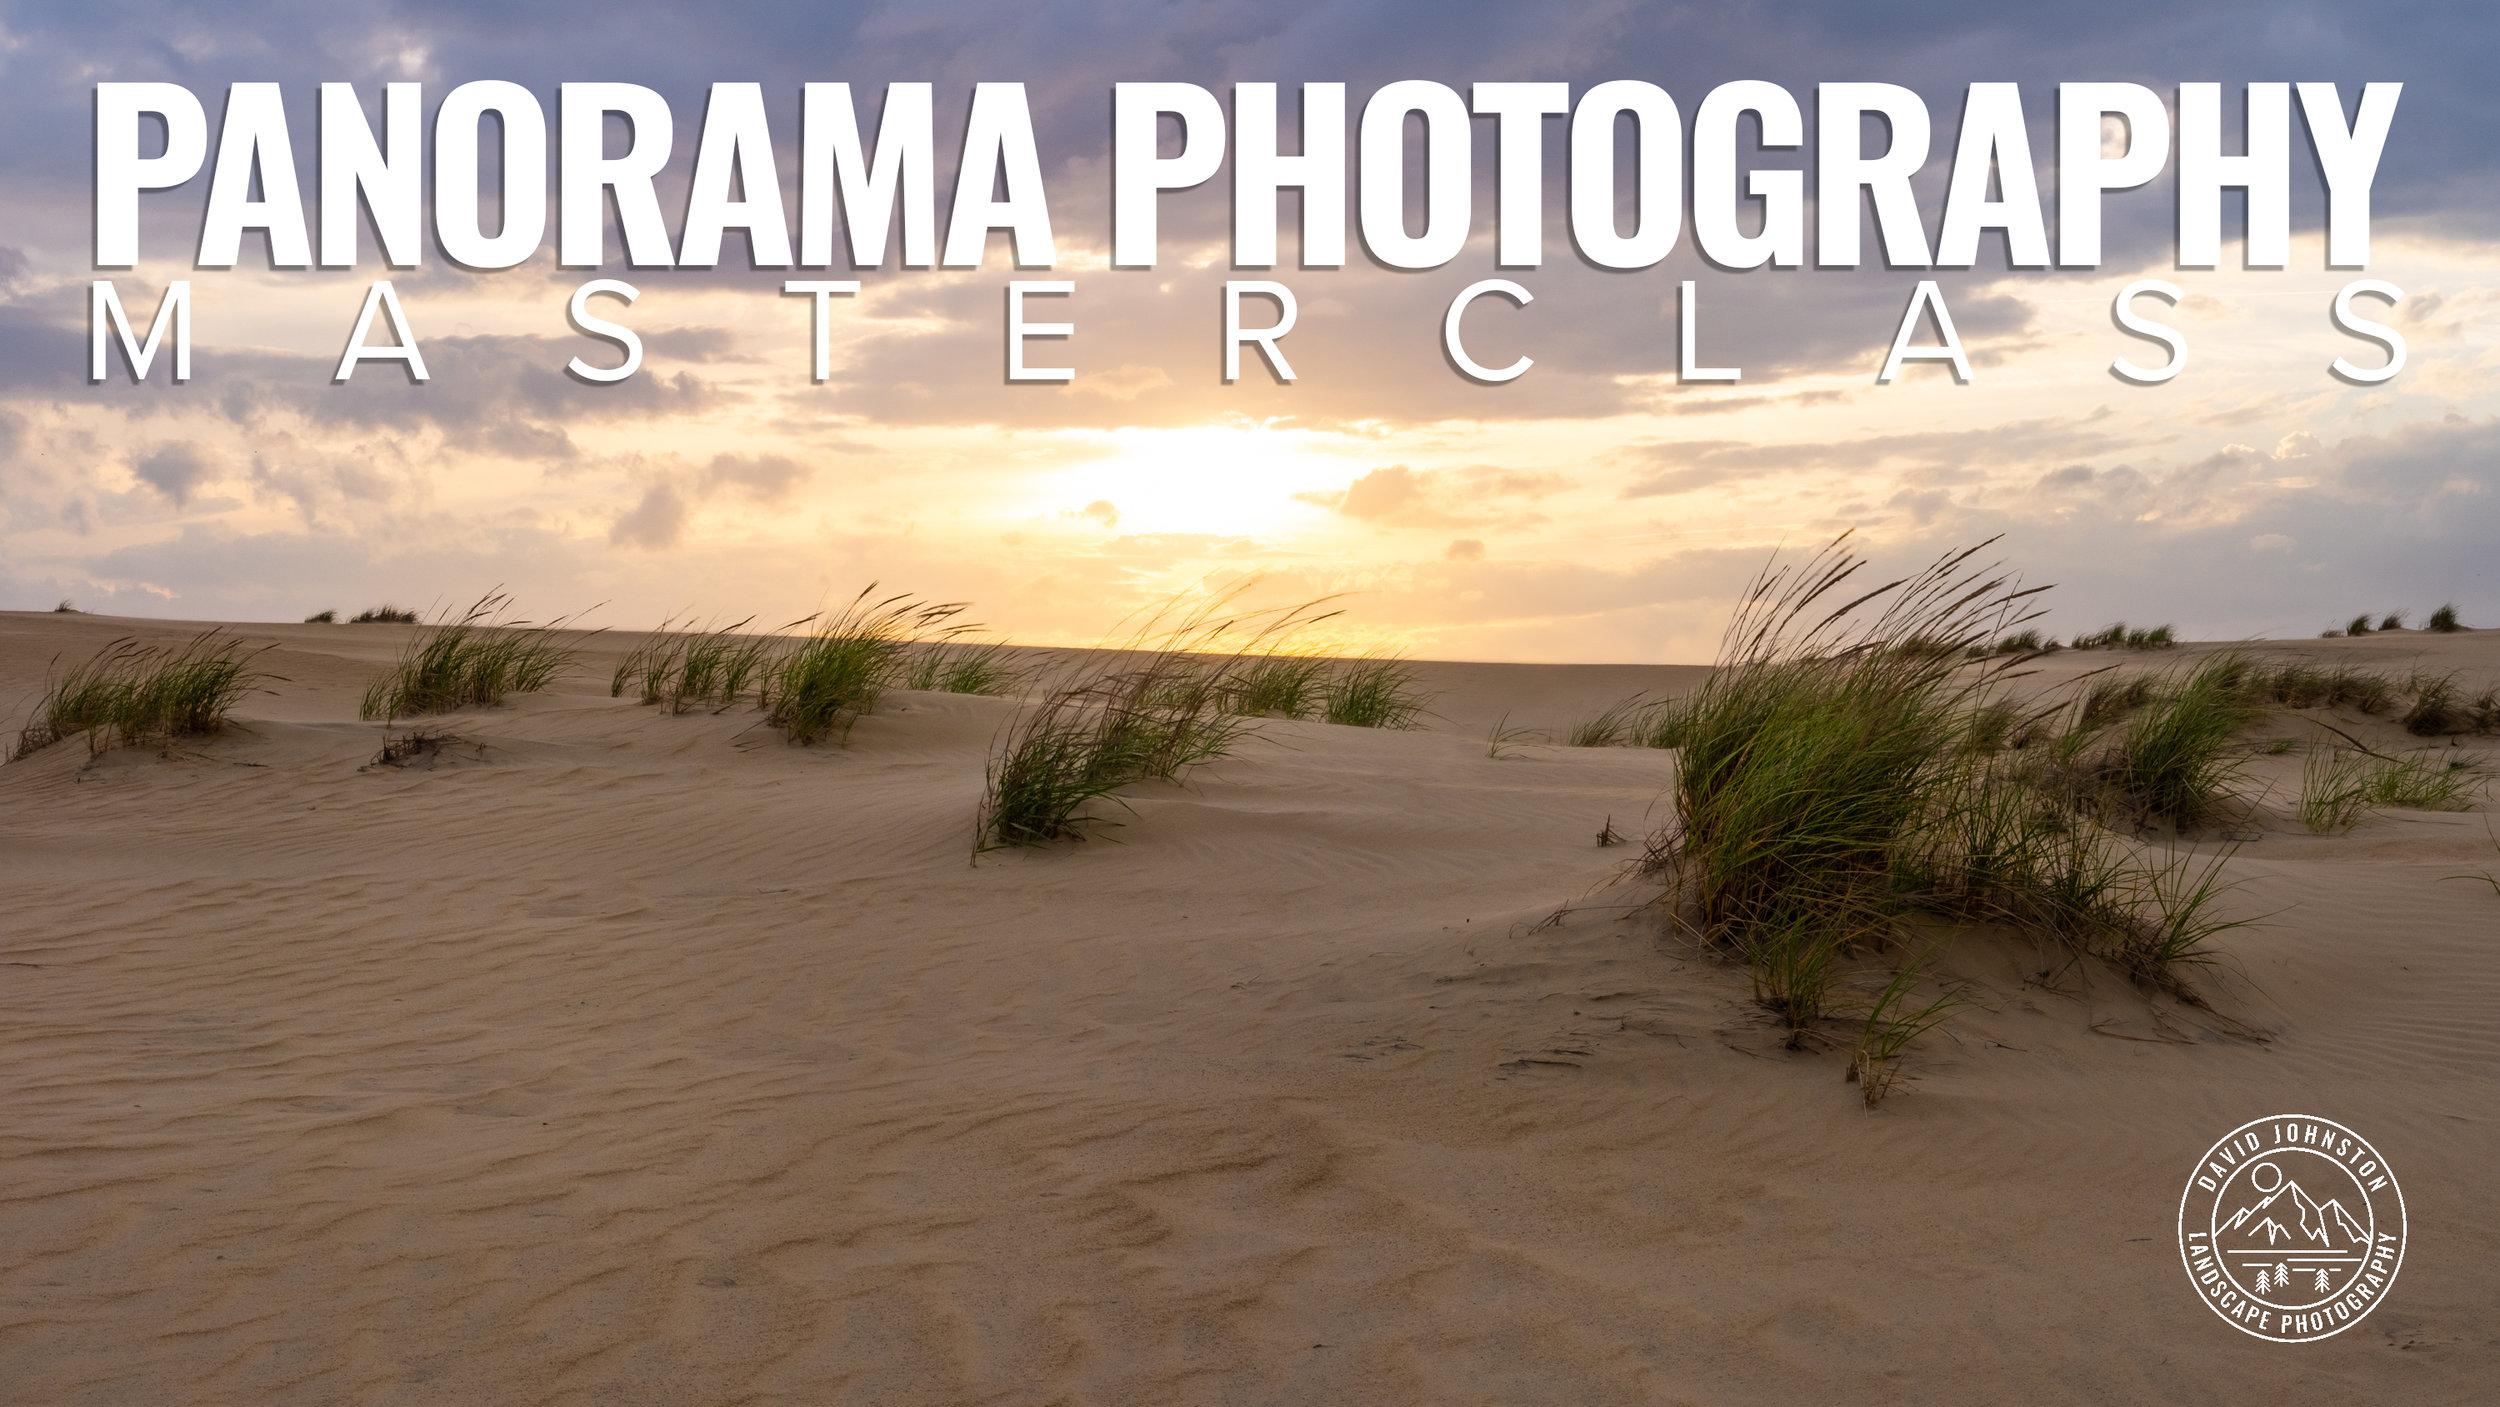 Panorama Photography Masterclass Image.jpg